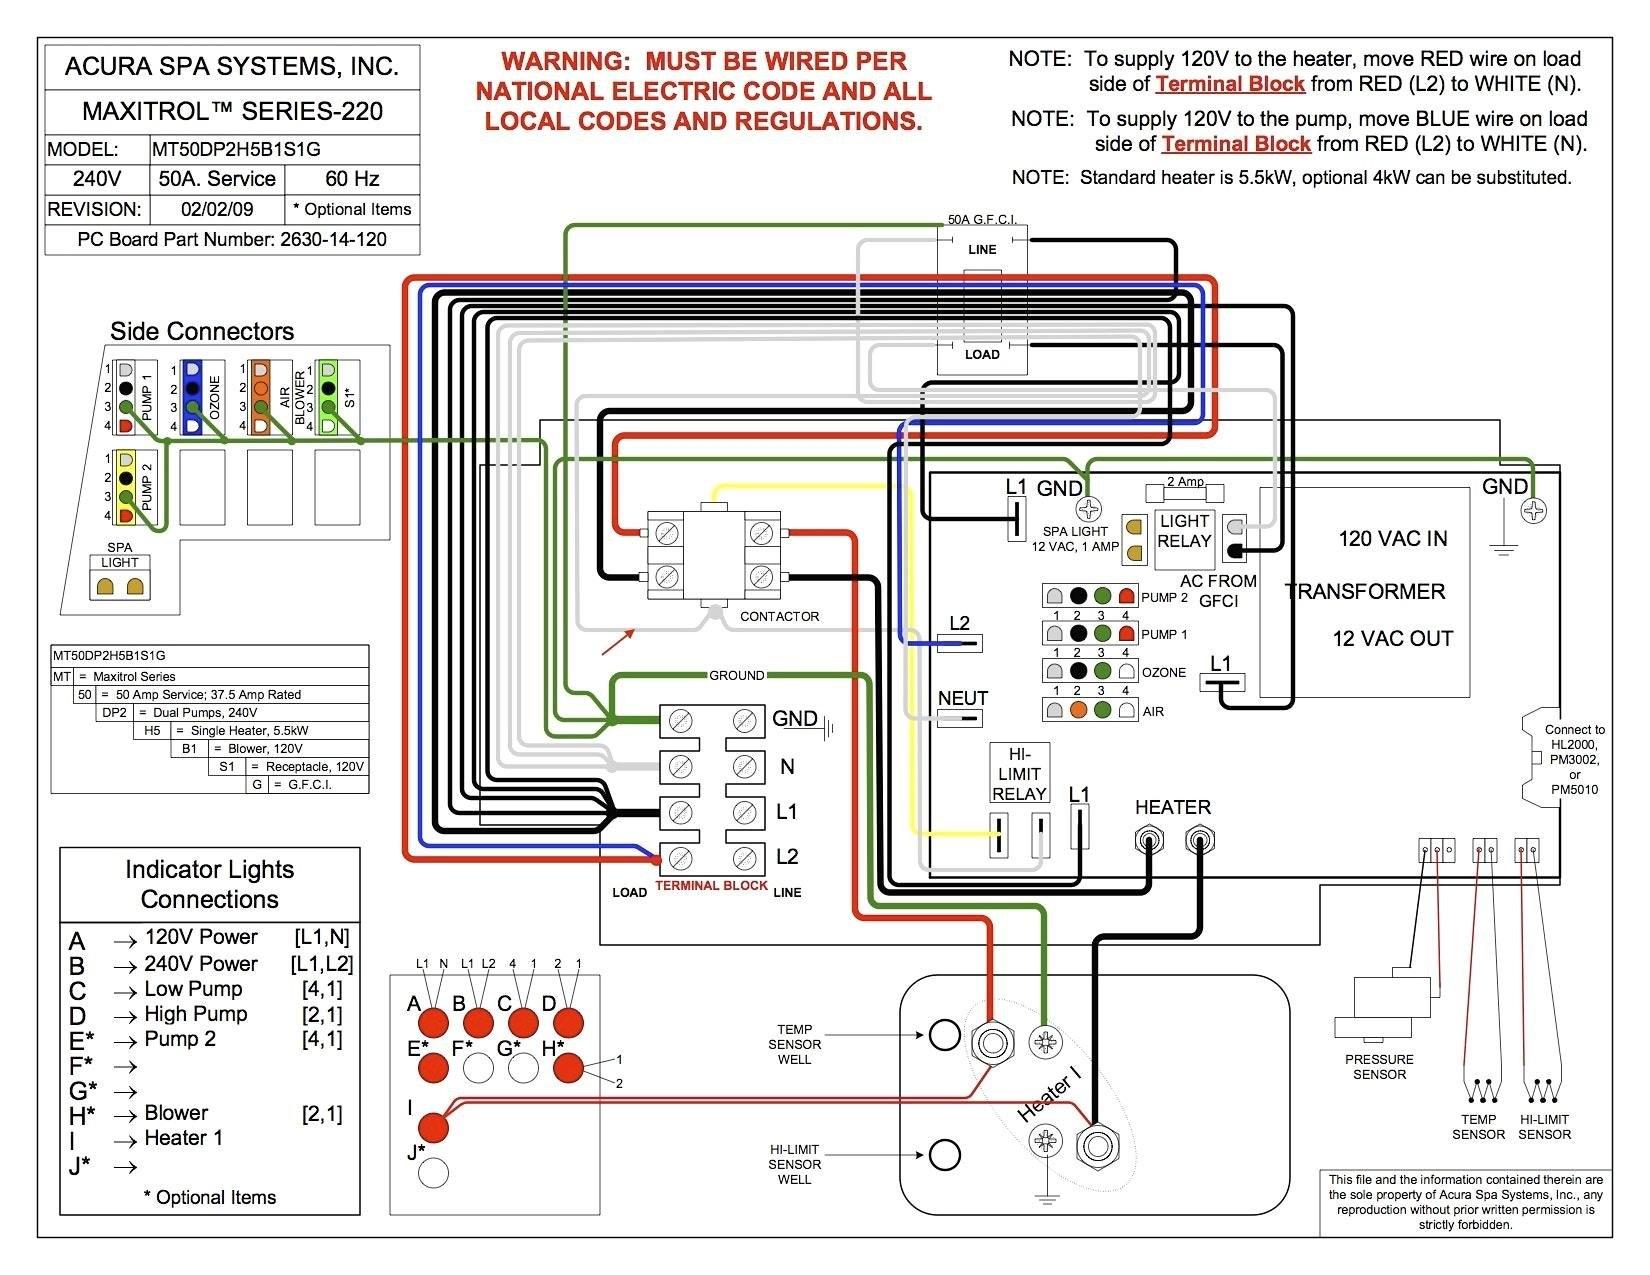 Hot Spring Spa Part Diagram - belknap home on parker wiring diagram, lynx wiring diagram, raven wiring diagram, phoenix wiring diagram, willcox wiring diagram,